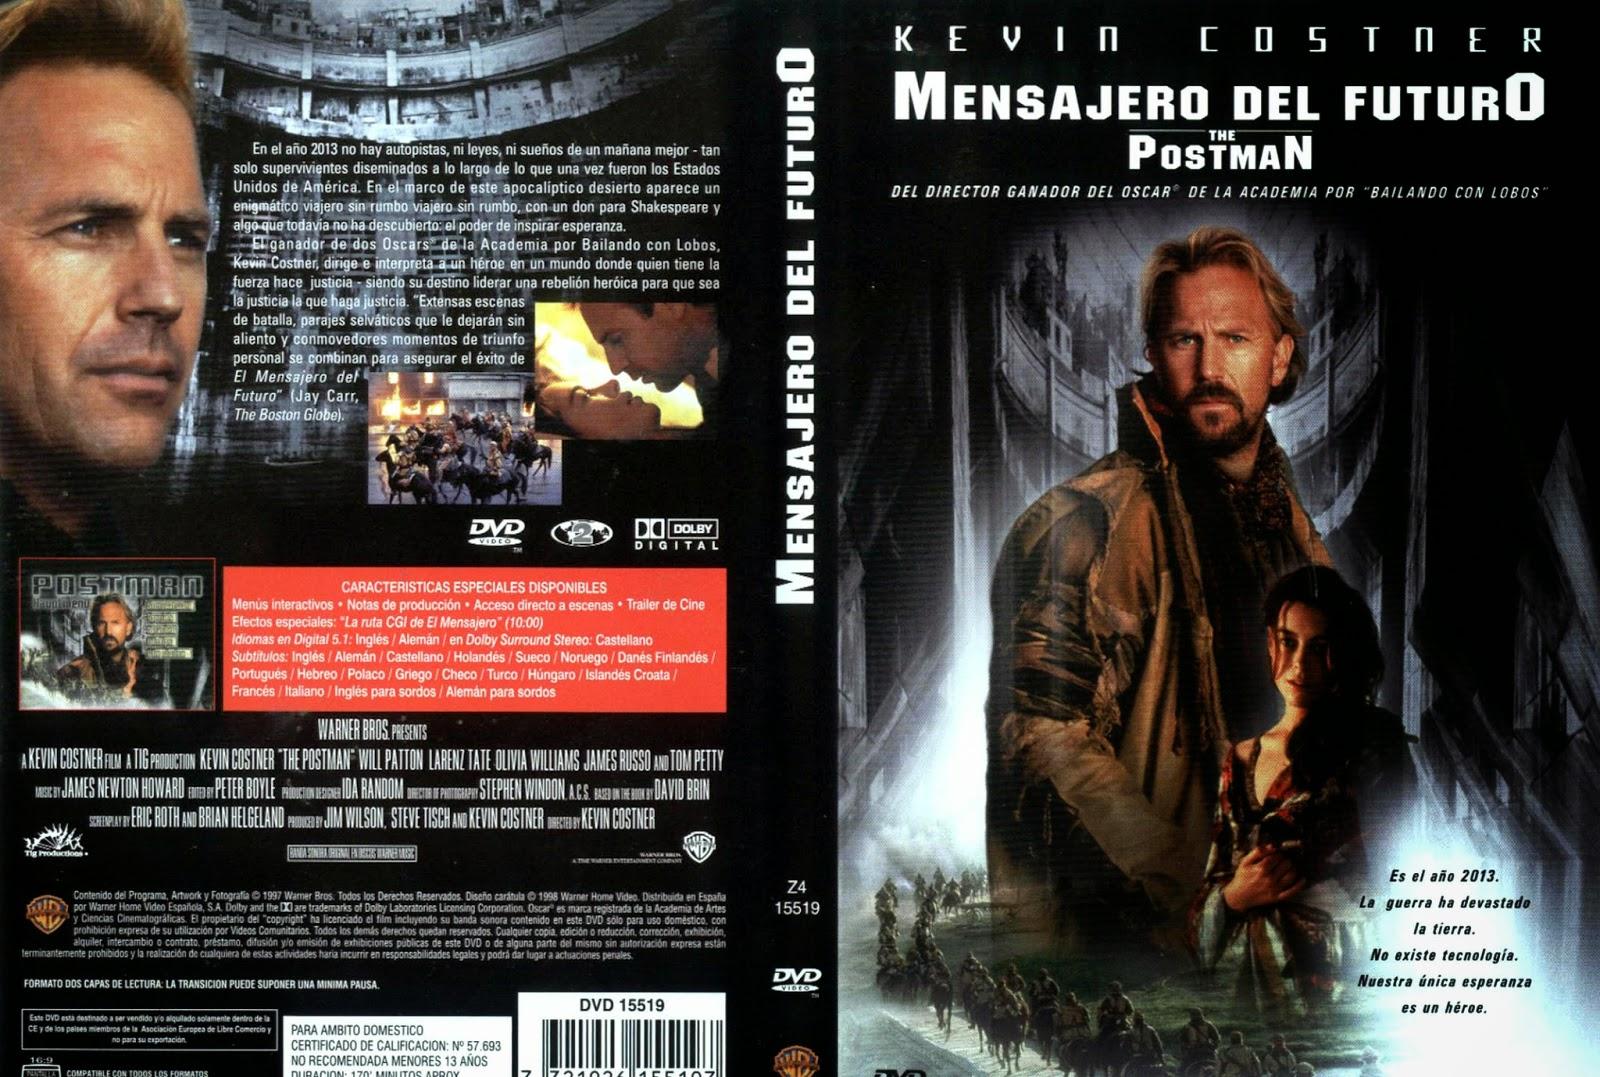 Mensajero Del Futuro DVD